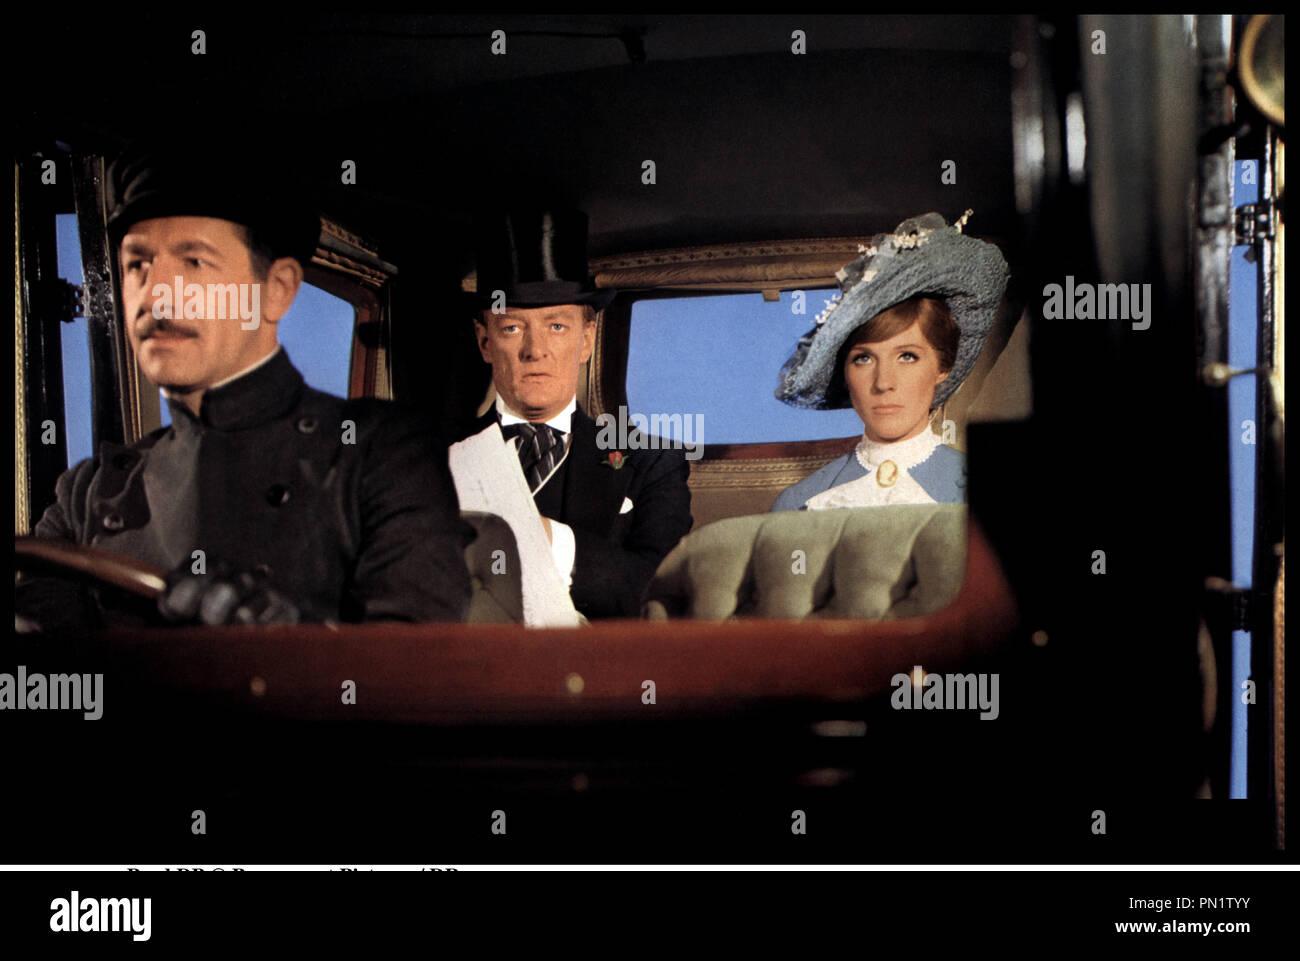 Prod DB © Paramount Pictures / DR DARLING LILI (DARLING LILI) de Blake Edwards 1970 USA avec Jeremy Kemp et Julie Andrews voiture, chauffeur - Stock Image